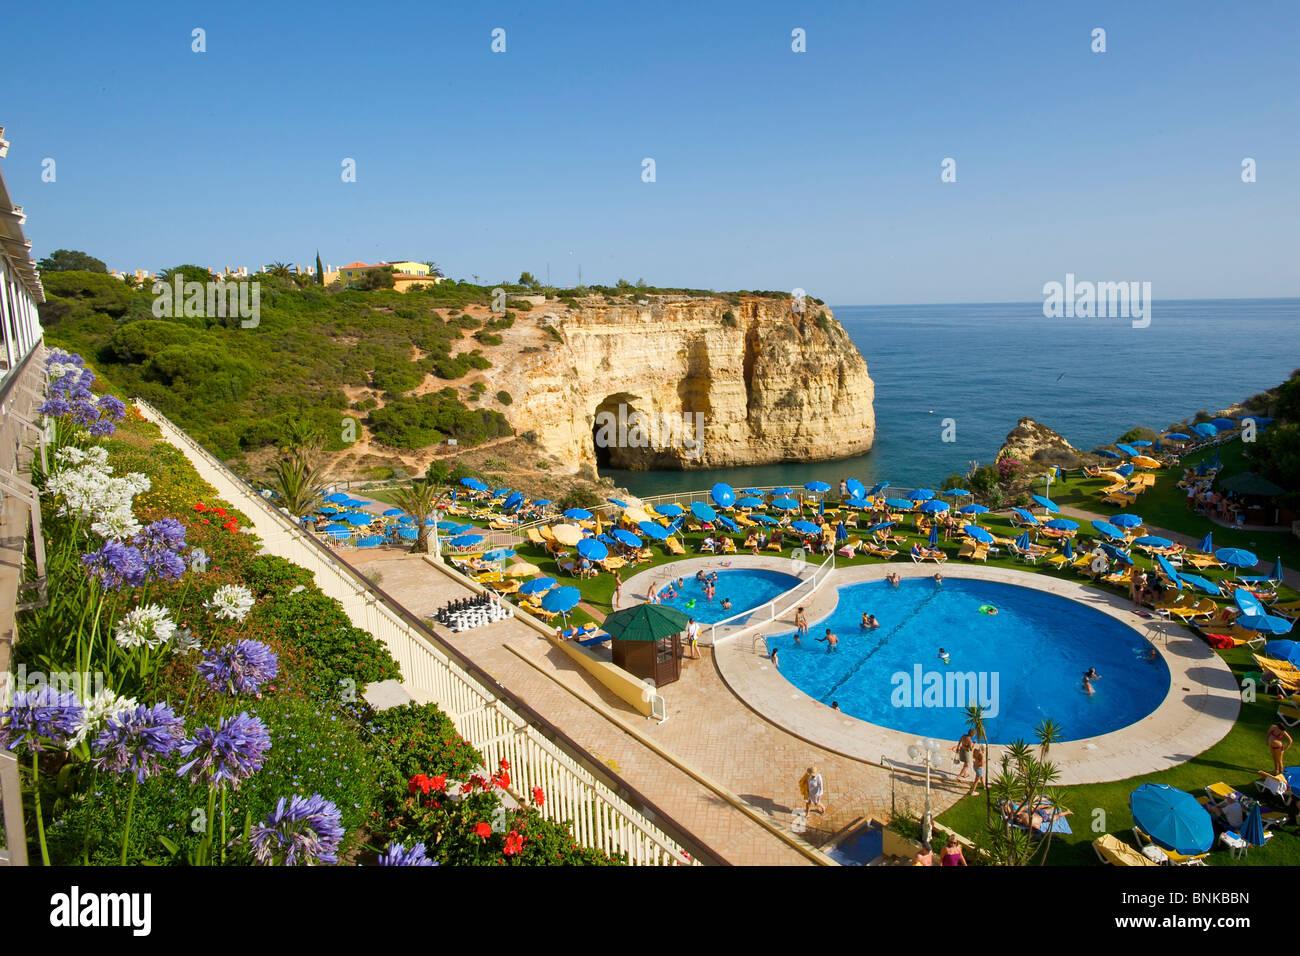 Algarve Portugal Hotel Pool Hotel Swimming Pool Pool Arrangement Pool Stock Photo Royalty Free